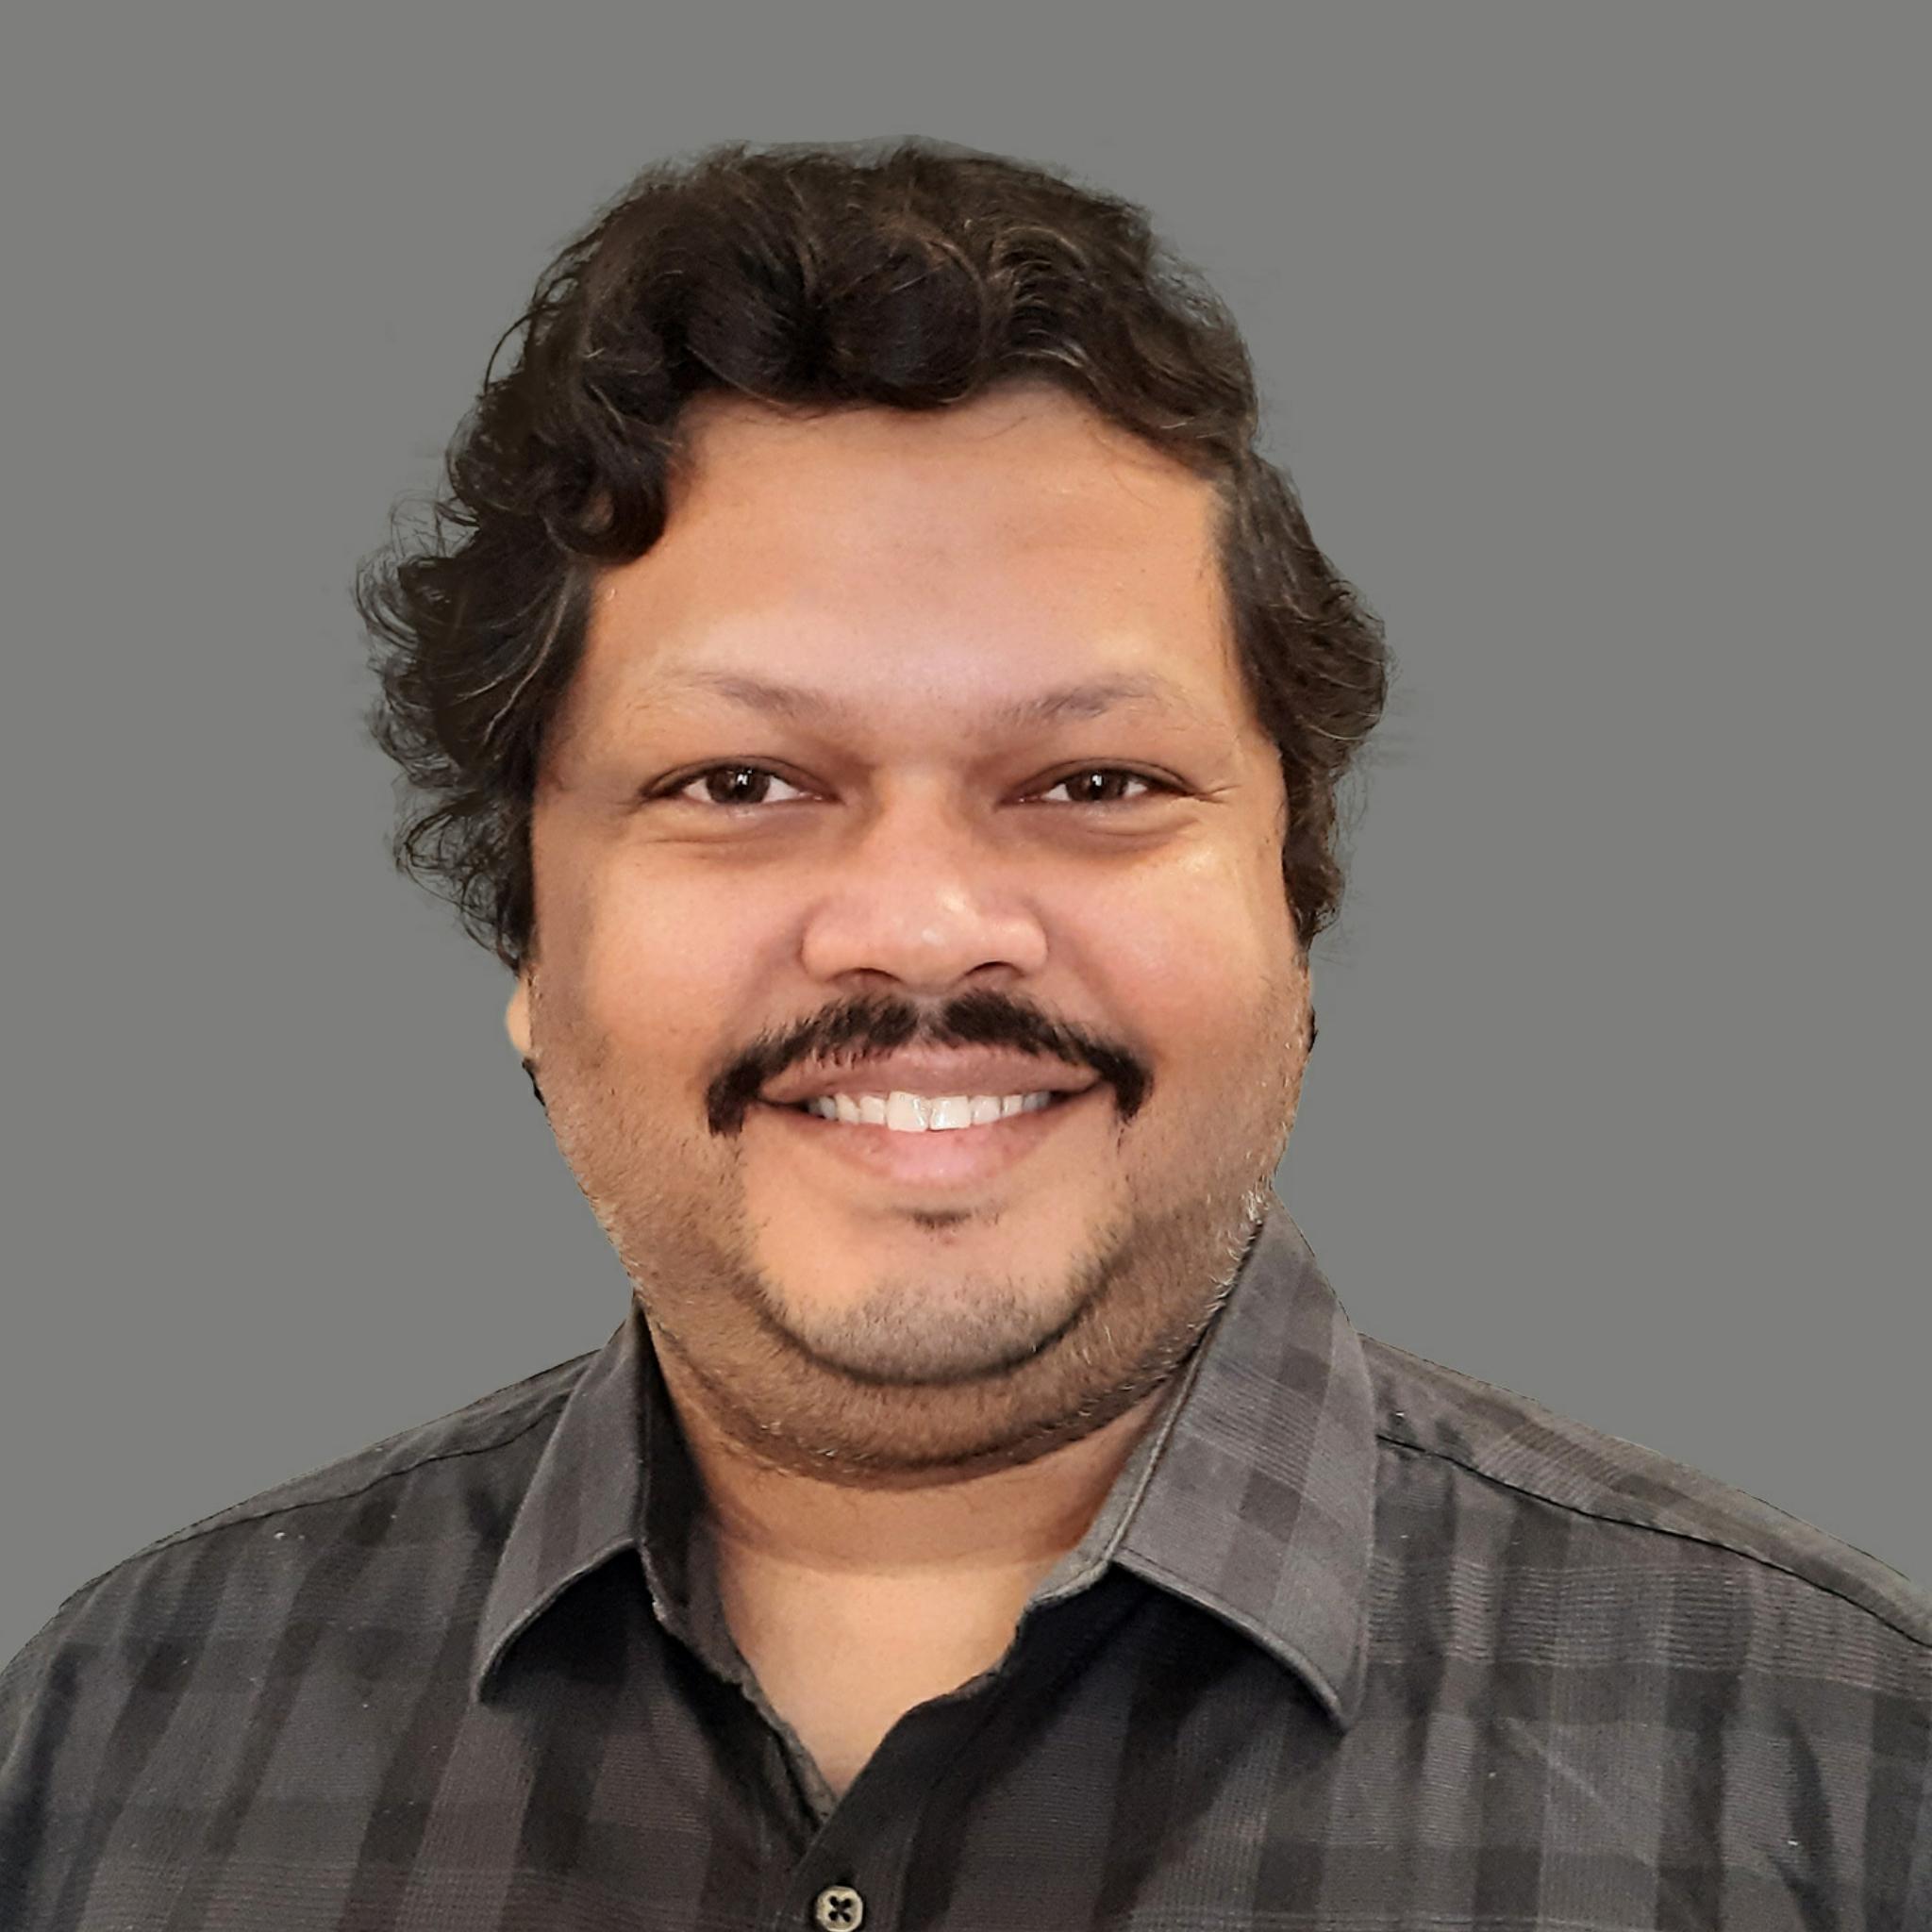 https://www.indiantelevision.com/sites/default/files/styles/smartcrop_800x800/public/images/tv-images/2021/06/18/photogrid_plus_1623999742100.jpg?itok=sAFE1oJX